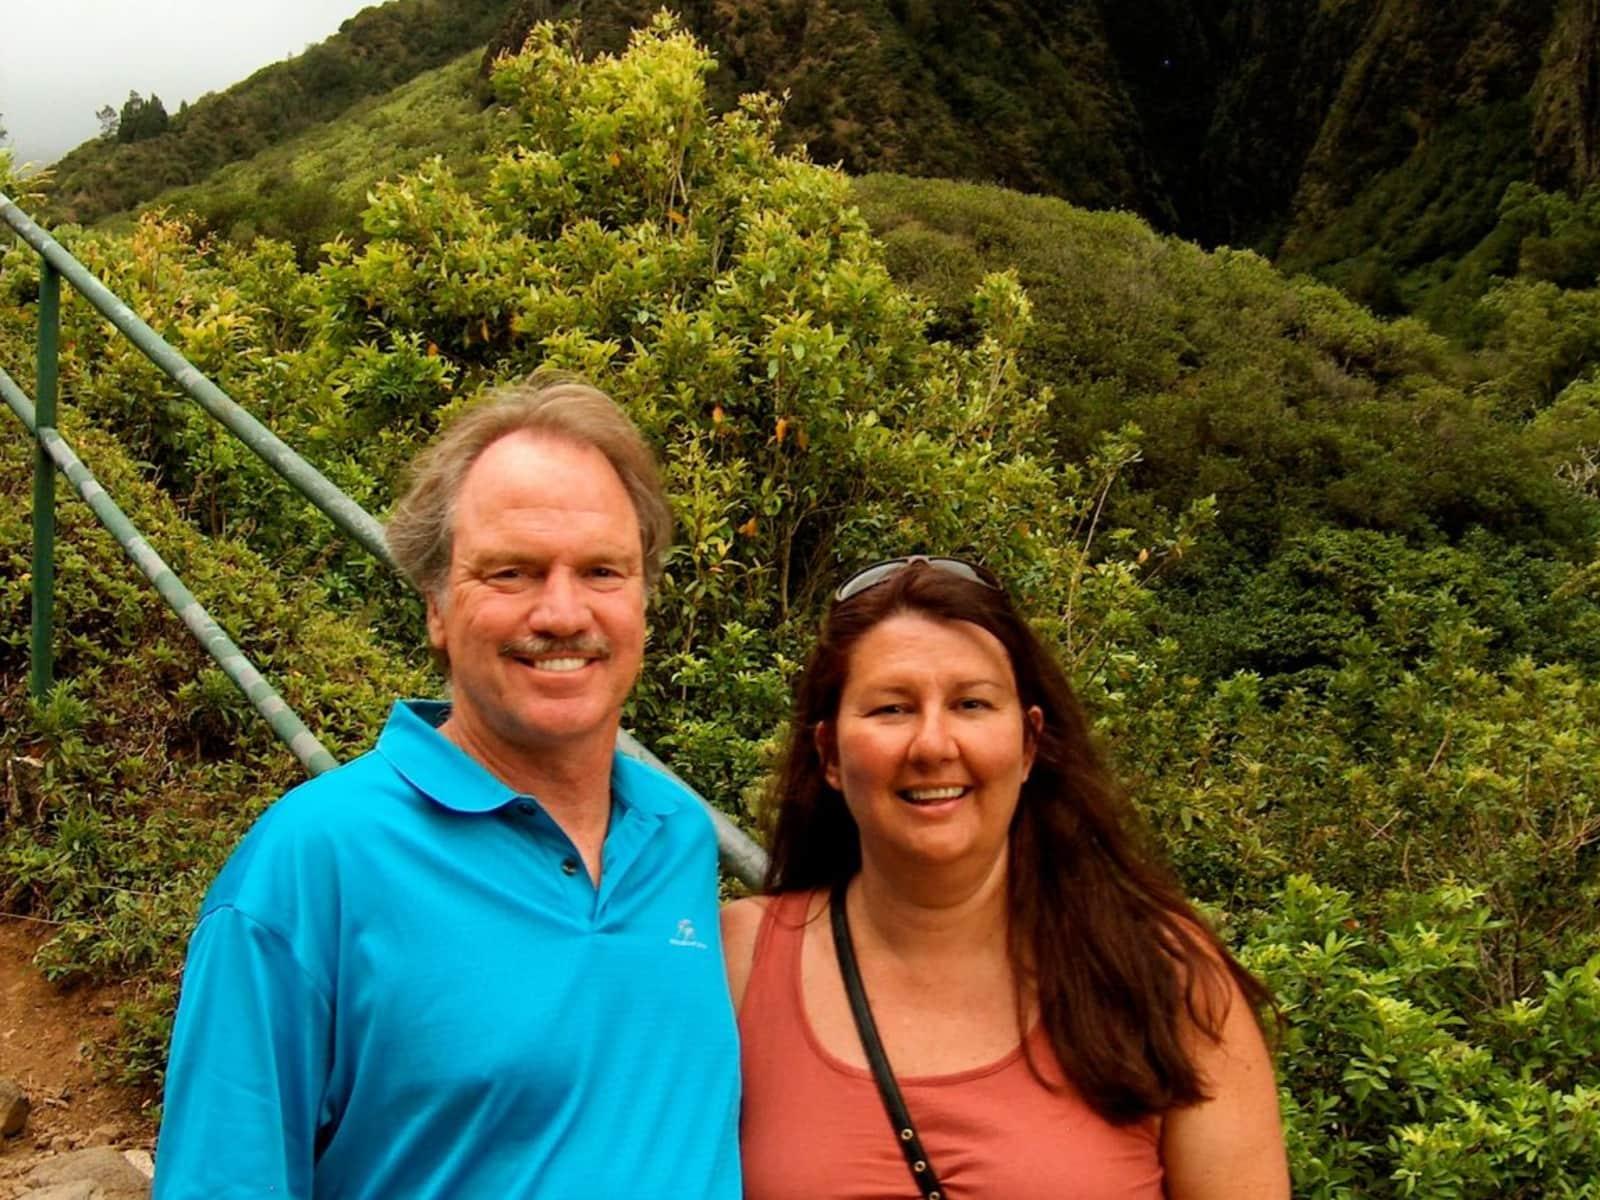 Karineh & Russell from Salt Lake City, Utah, United States